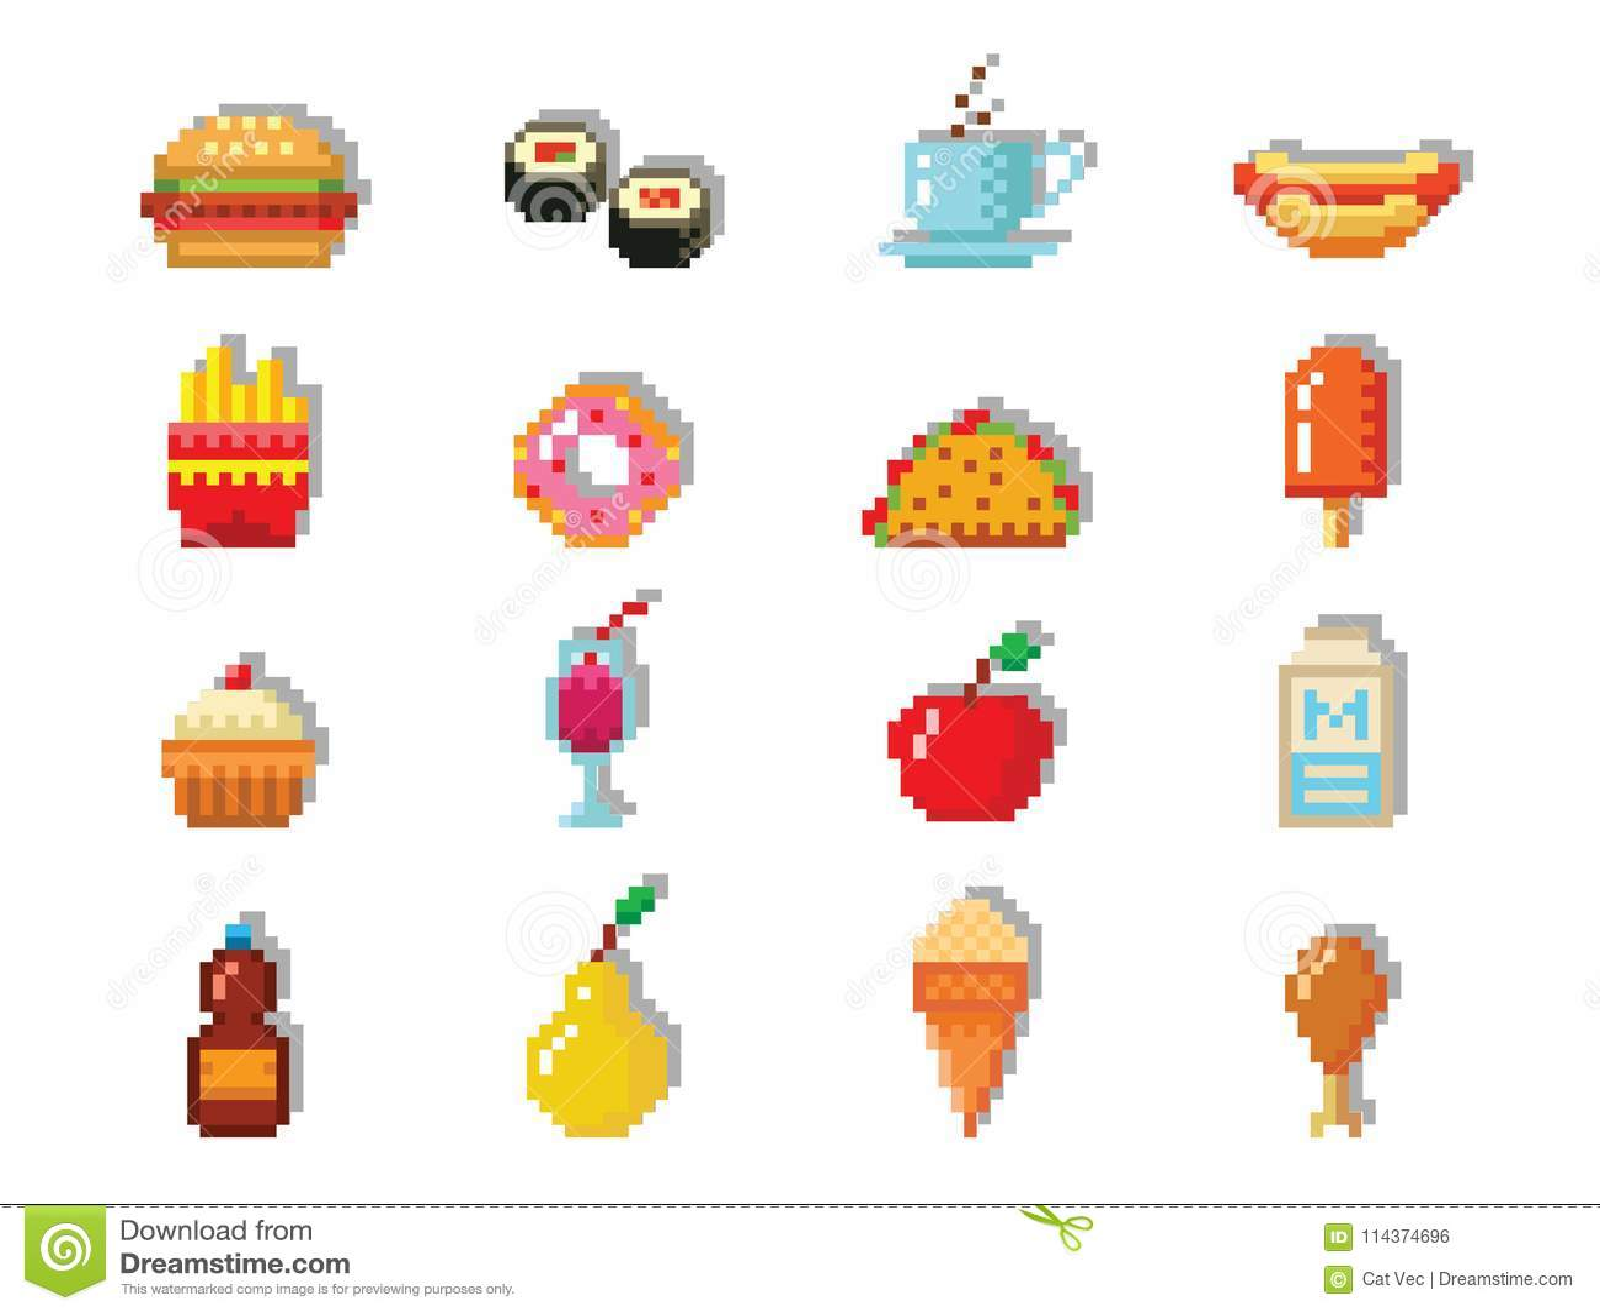 Pixel Art Food Computer Design Icons Vector Illustration Restaurant Pixelated Element Fast Food Retro Game Web Graphic Stock Vector Illustration Of Cake Food 114374696